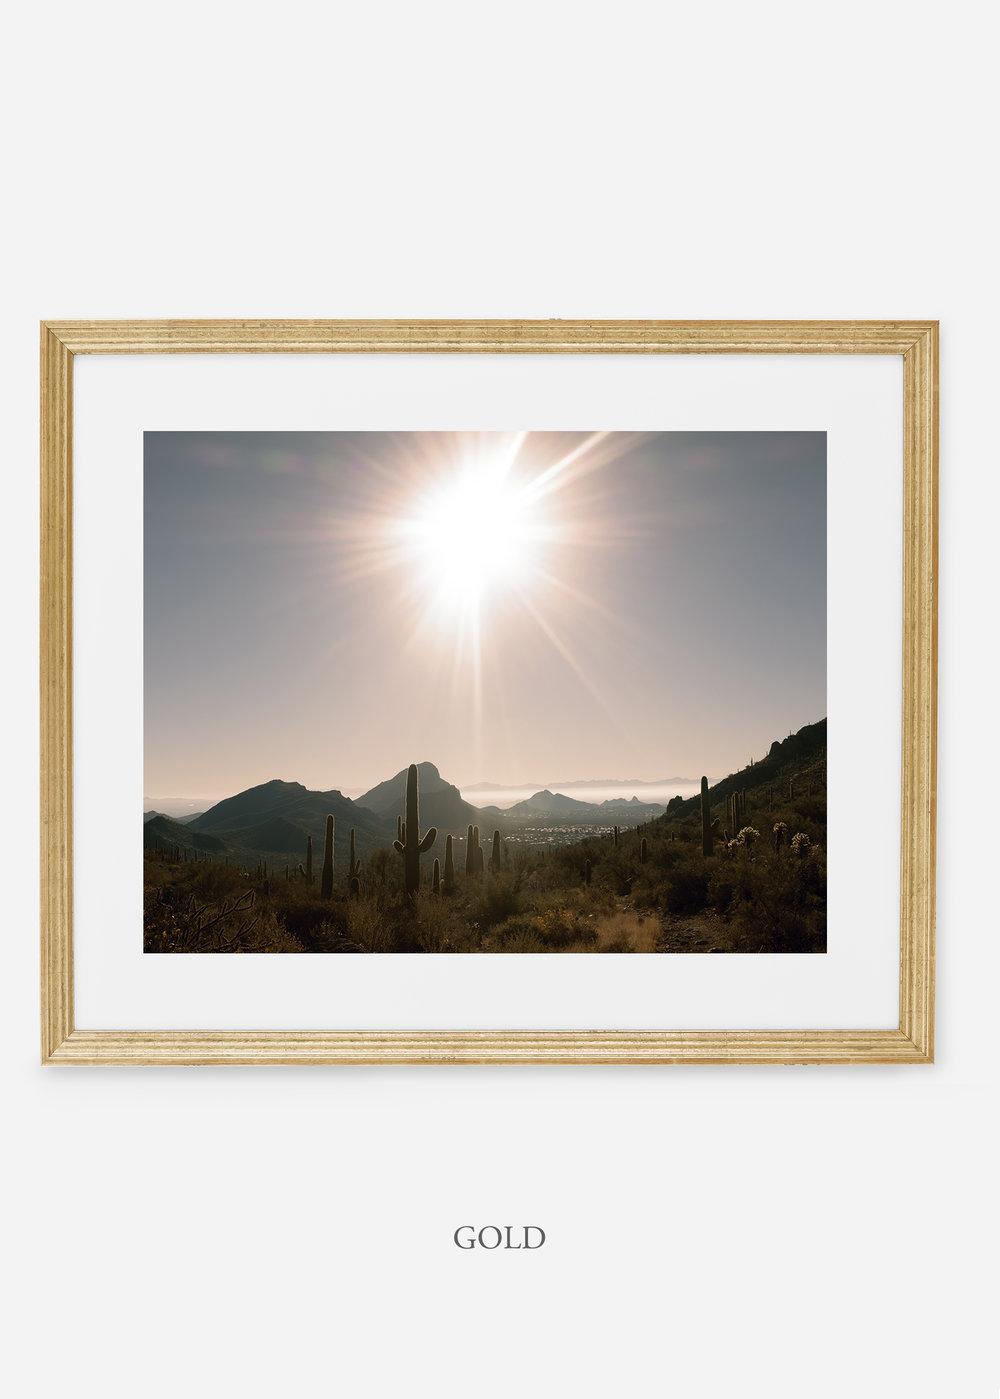 goldframe-saguaroNo.15-wildercalifornia-art-wallart-cactusprint-homedecor-prints-arizona-botanical-artwork-interiordesign.jpg